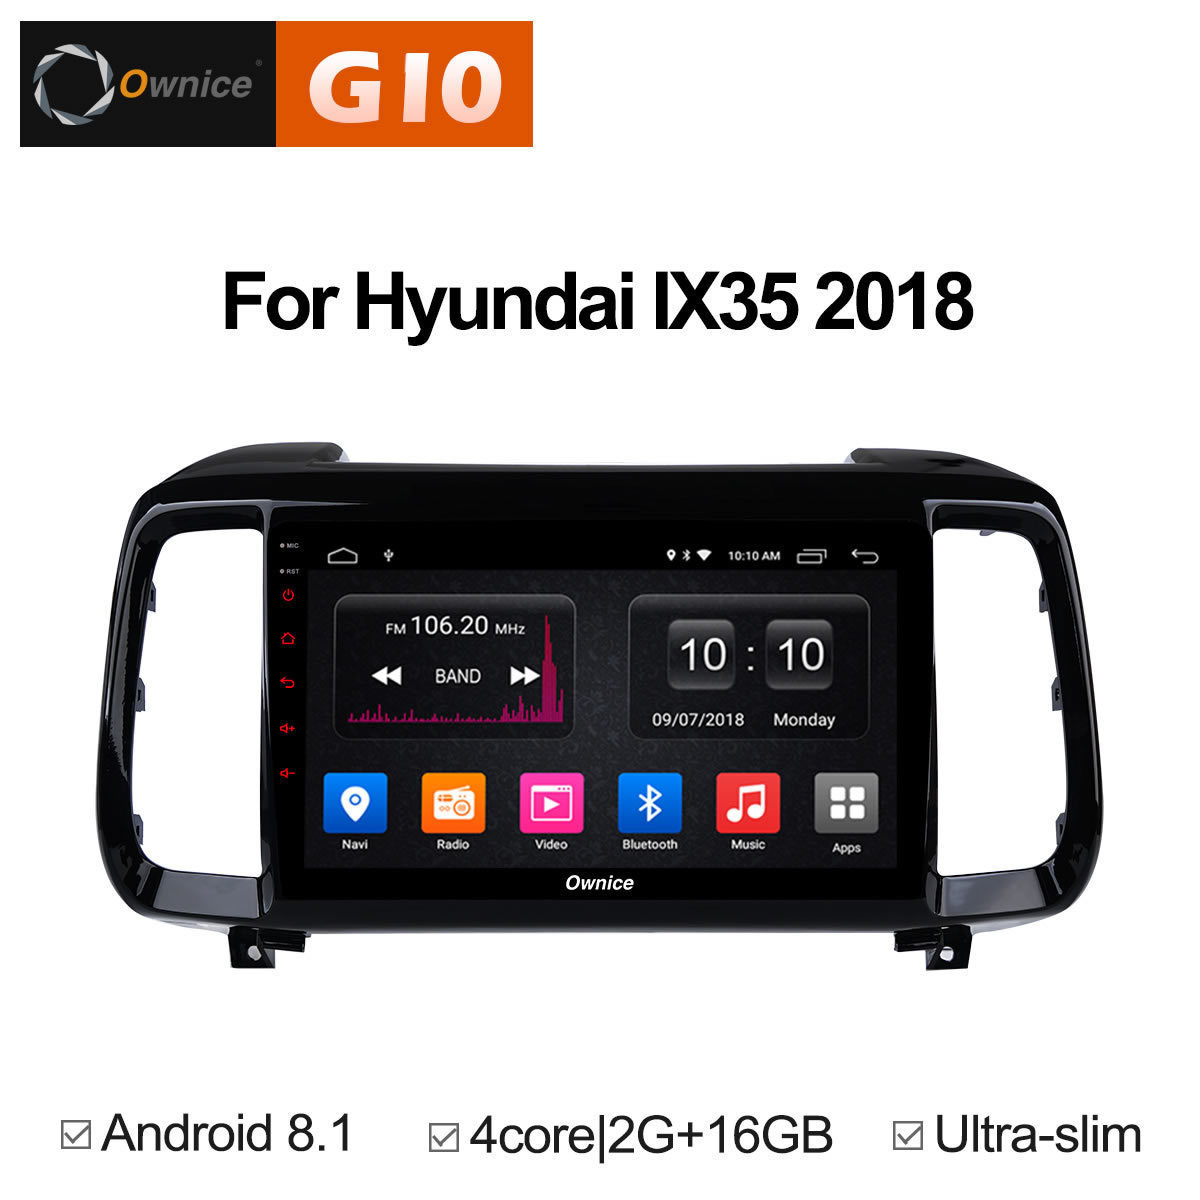 For Hyundai IX35 2018 2019 auto Stereo Intelligent Smart Multimedia DAB Vehicle Android 8.1 Auto 2 Din Radio GPS DVD Car Player